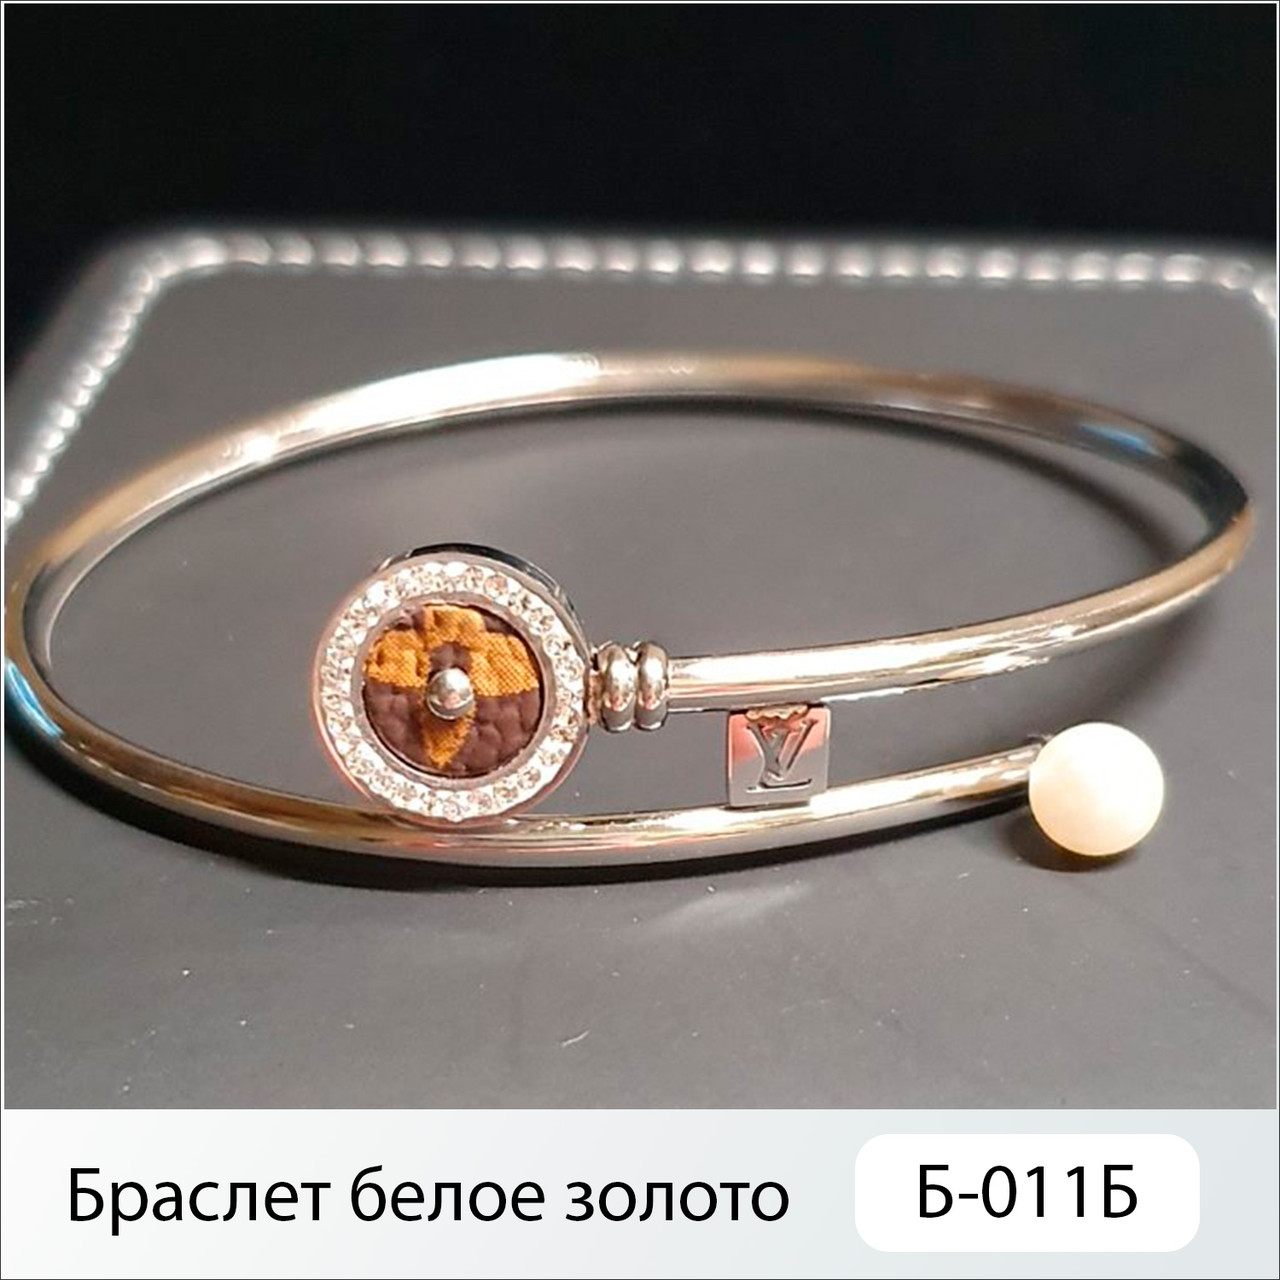 Браслет белое золото Б-011Б